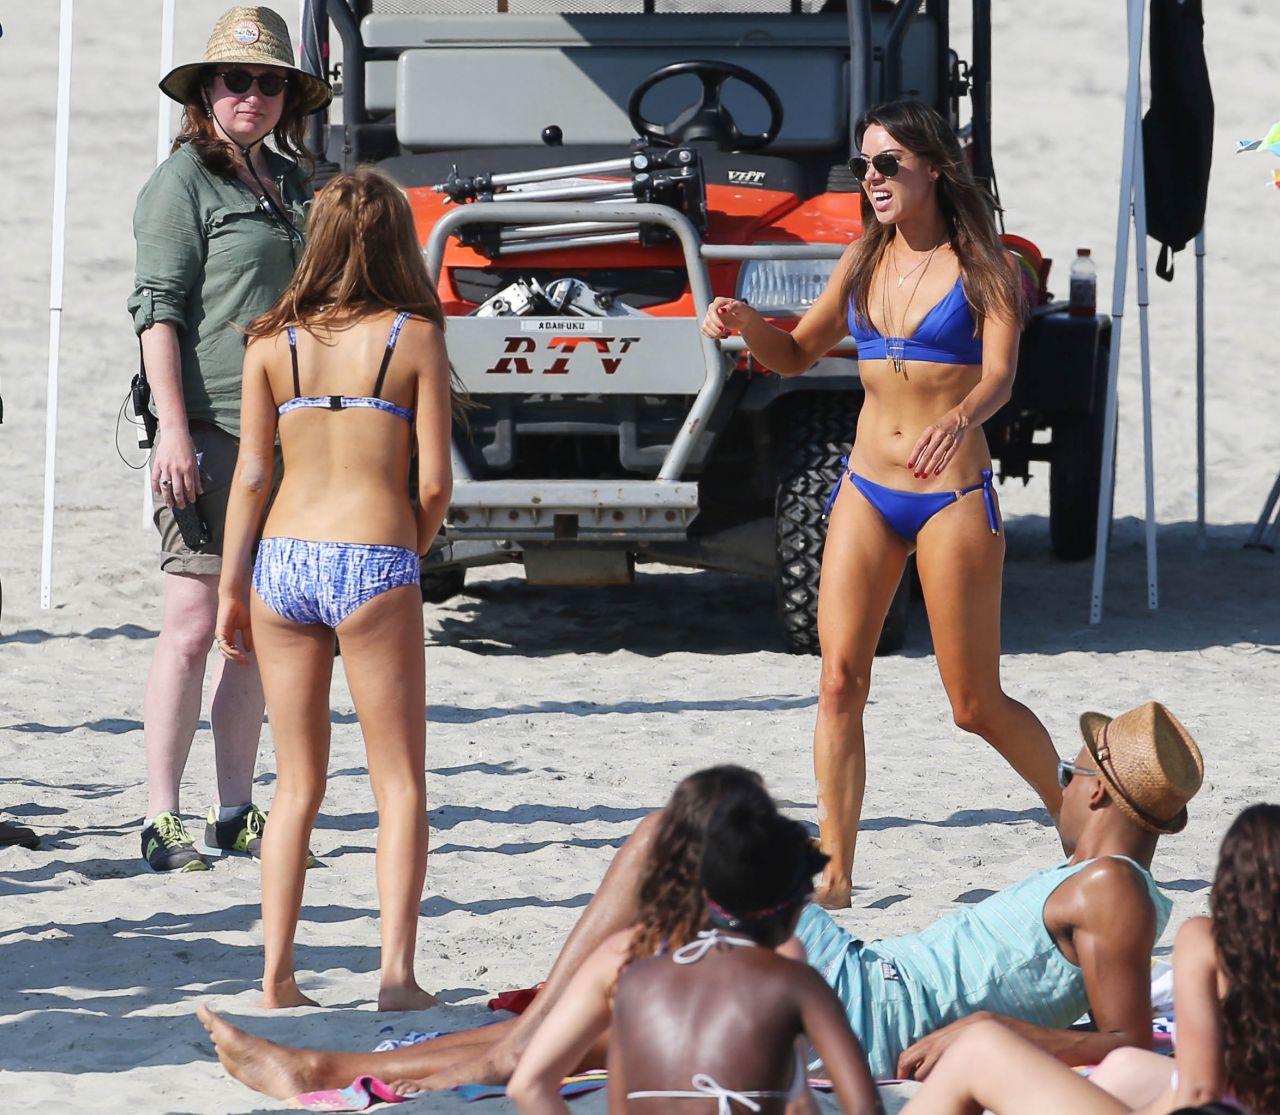 Zoey Deutch Bikini Photos – Dirty Grandpa Set Photos ... Zac Efron Nyc